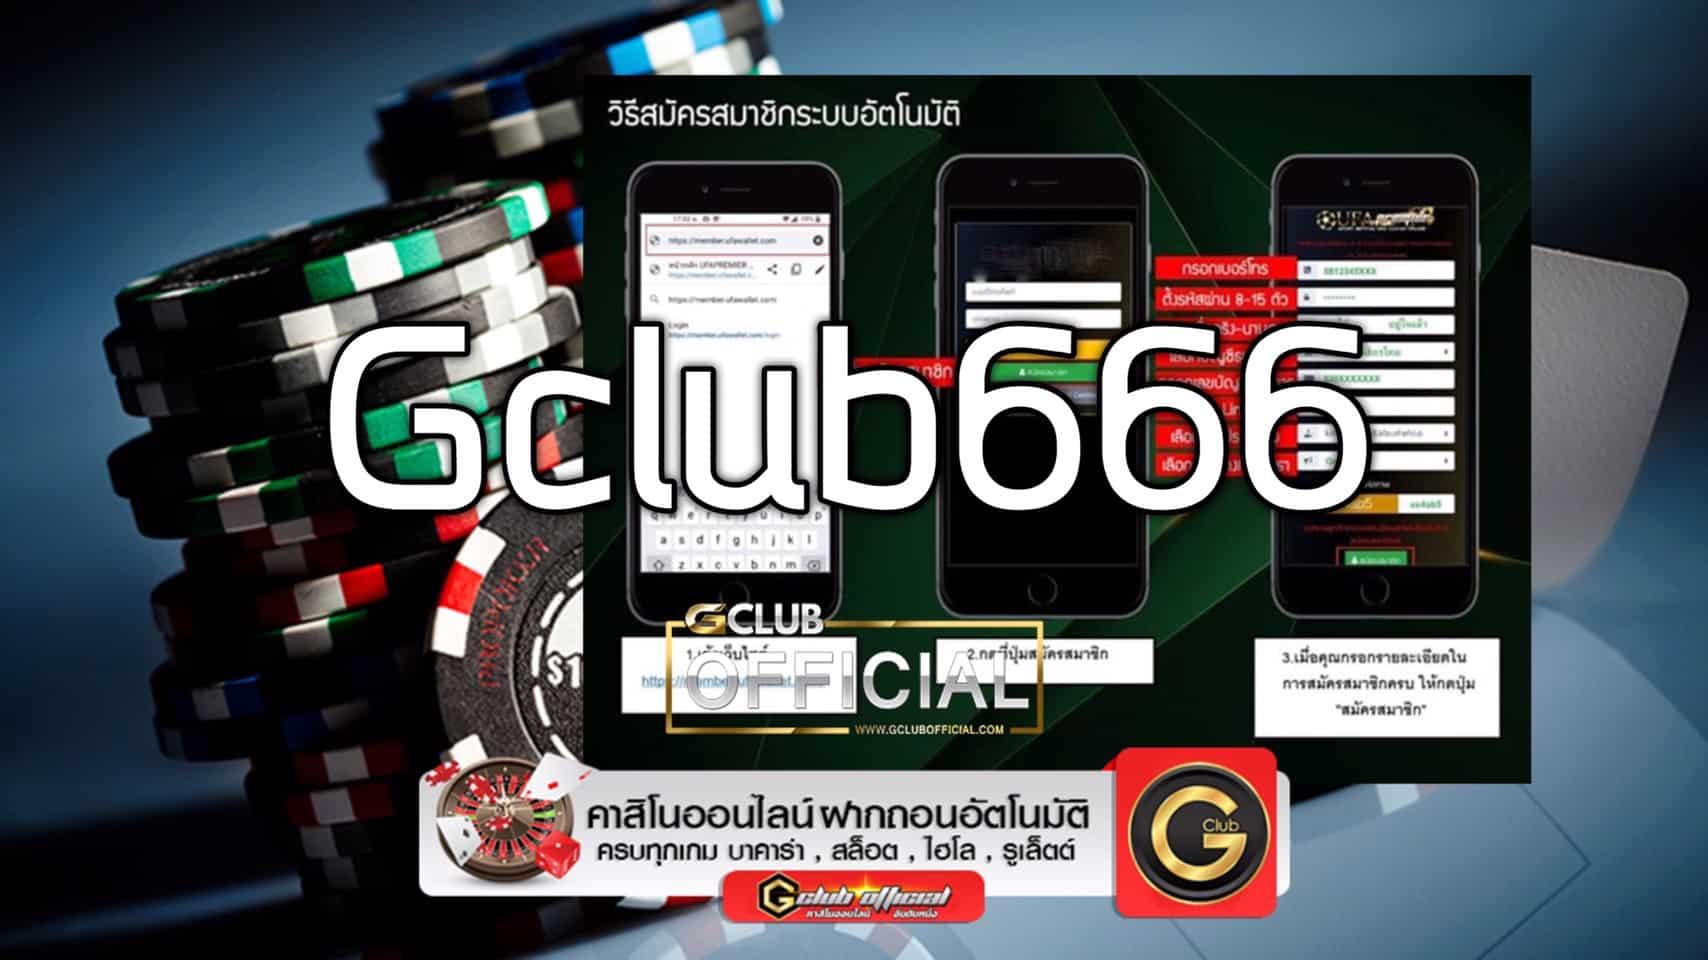 gclub666 สมัครง่าย เล่นเพลิน